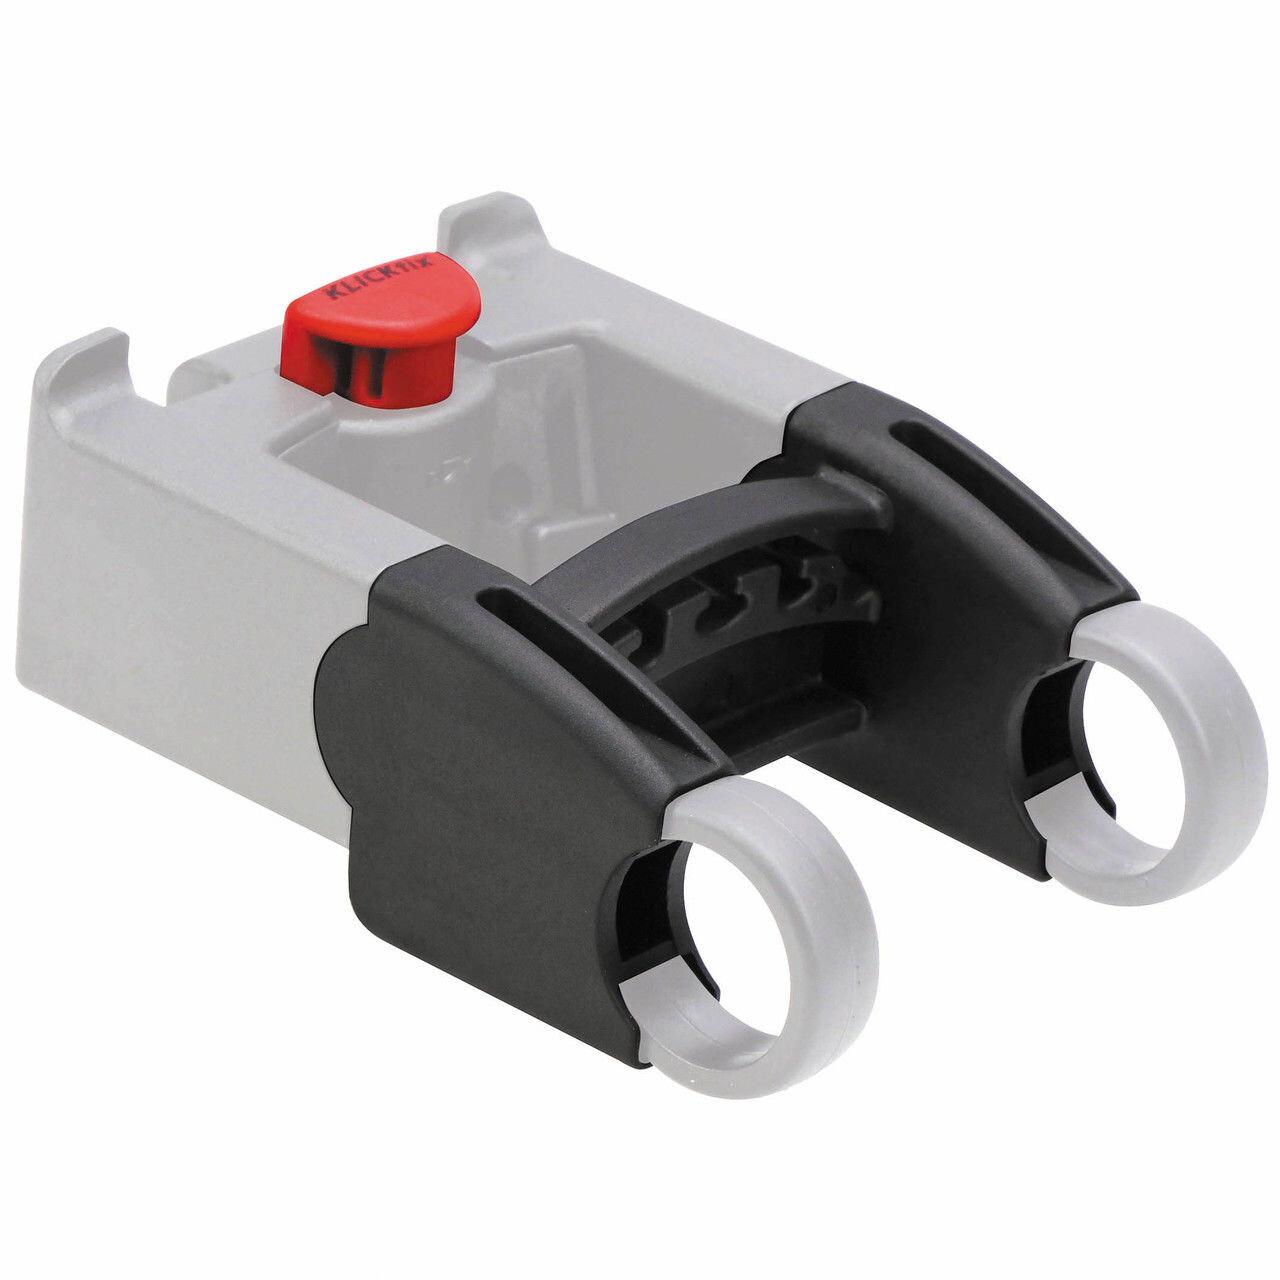 KlickFix Spacersæt 43 mm til cykelstyrsadapter   Bags accessories